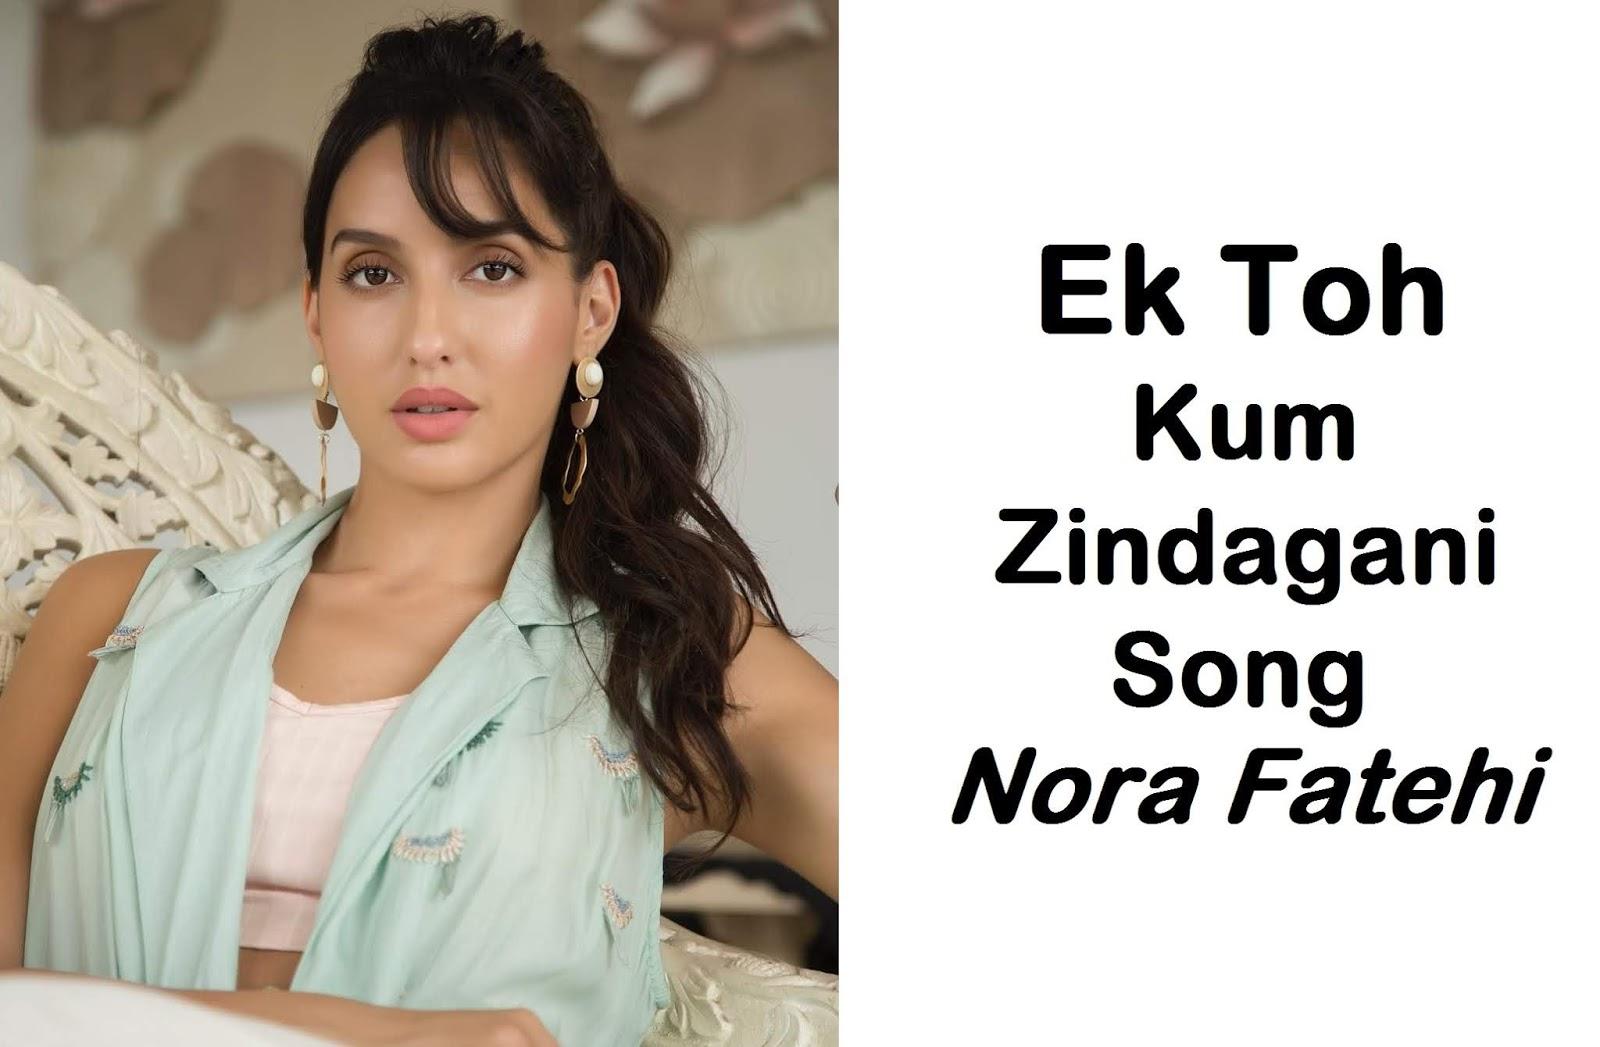 Ek Toh Kum Zindagani Song Nora Fatehi Neha Kakkar Marjaavaan Dream Vs Bollywood